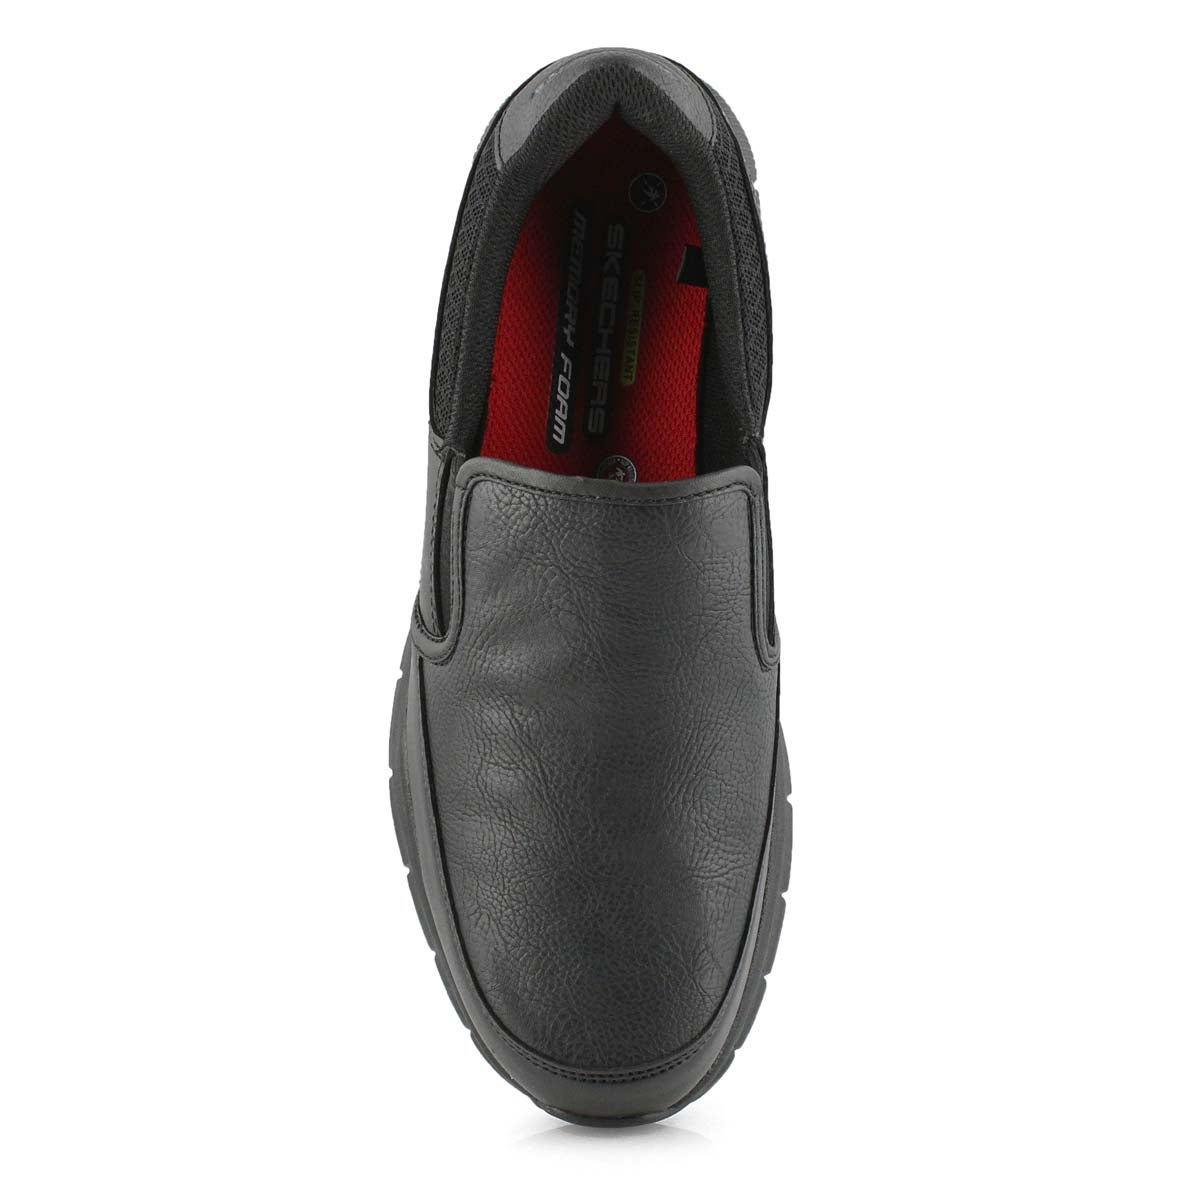 Mns Nampa Groton blk slip resistant shoe